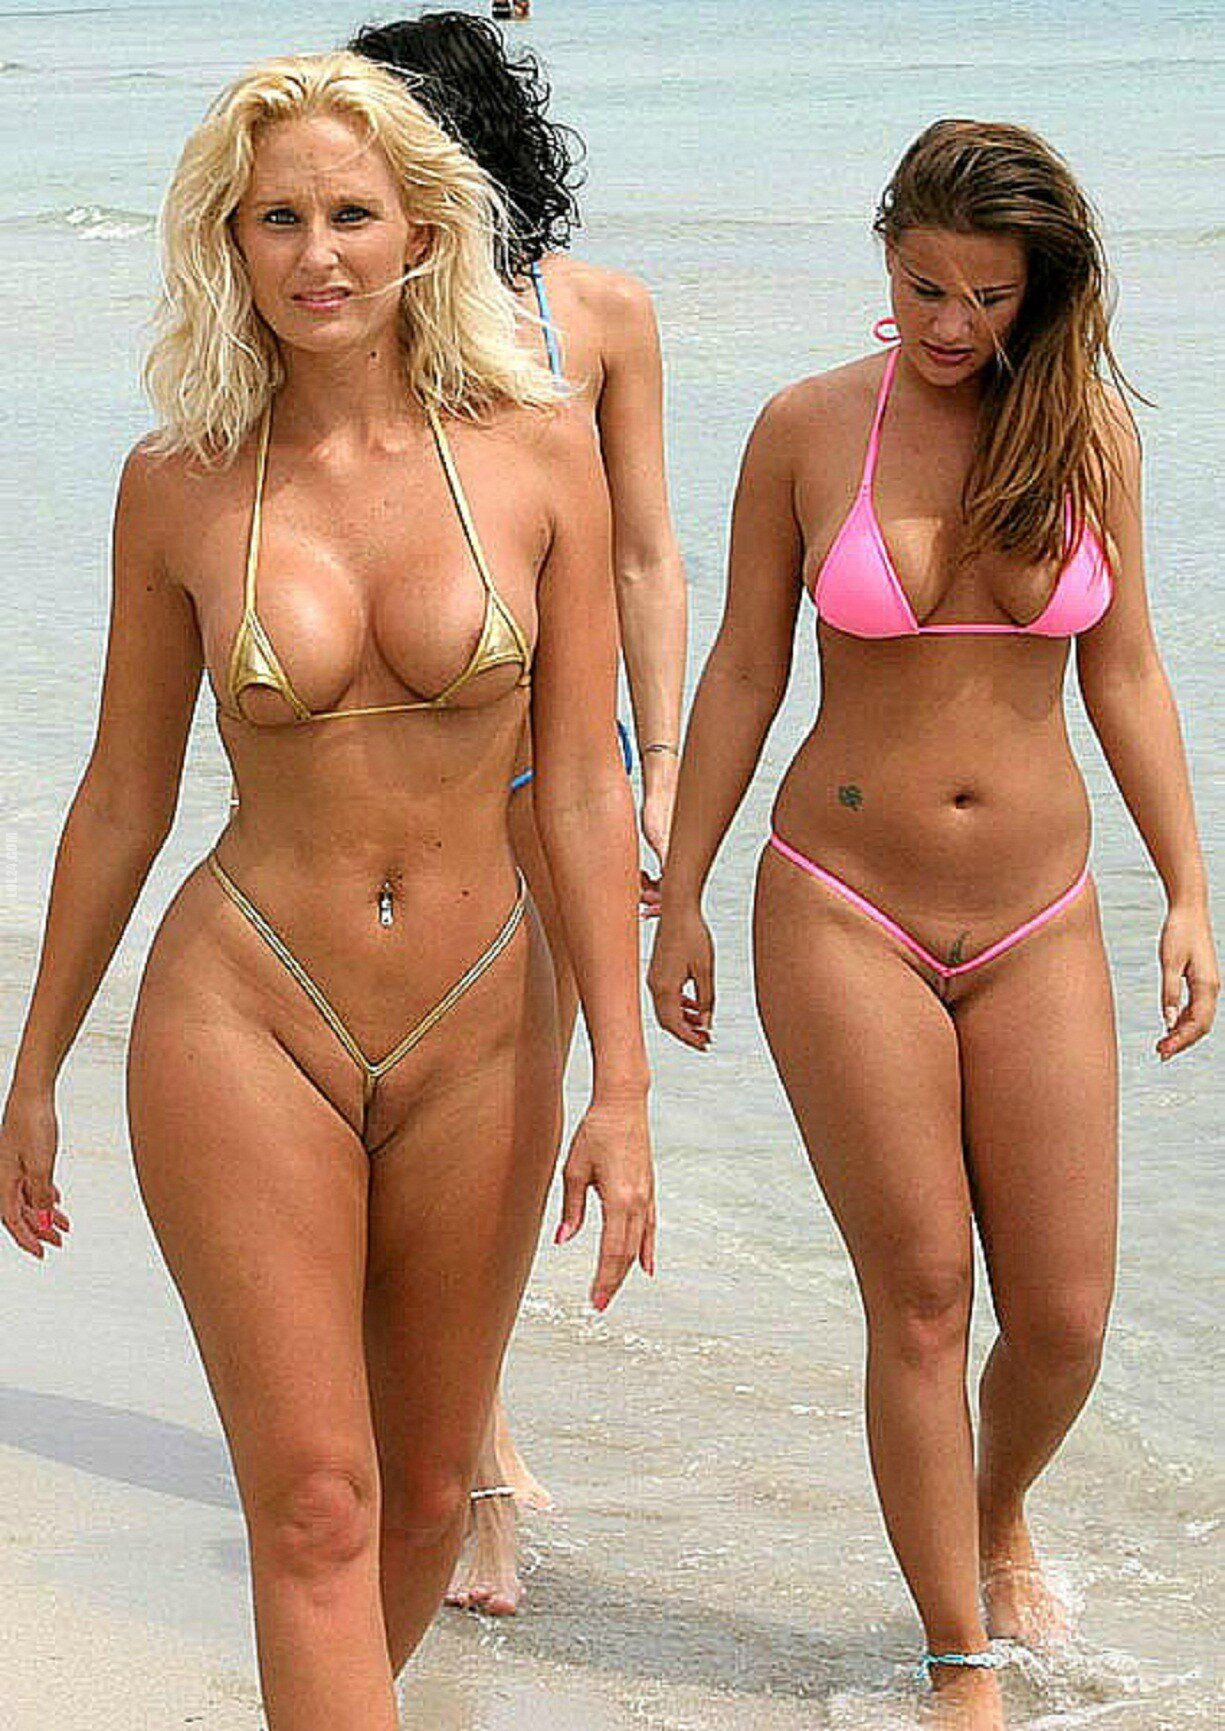 Фото пляж без бикини 16 фотография